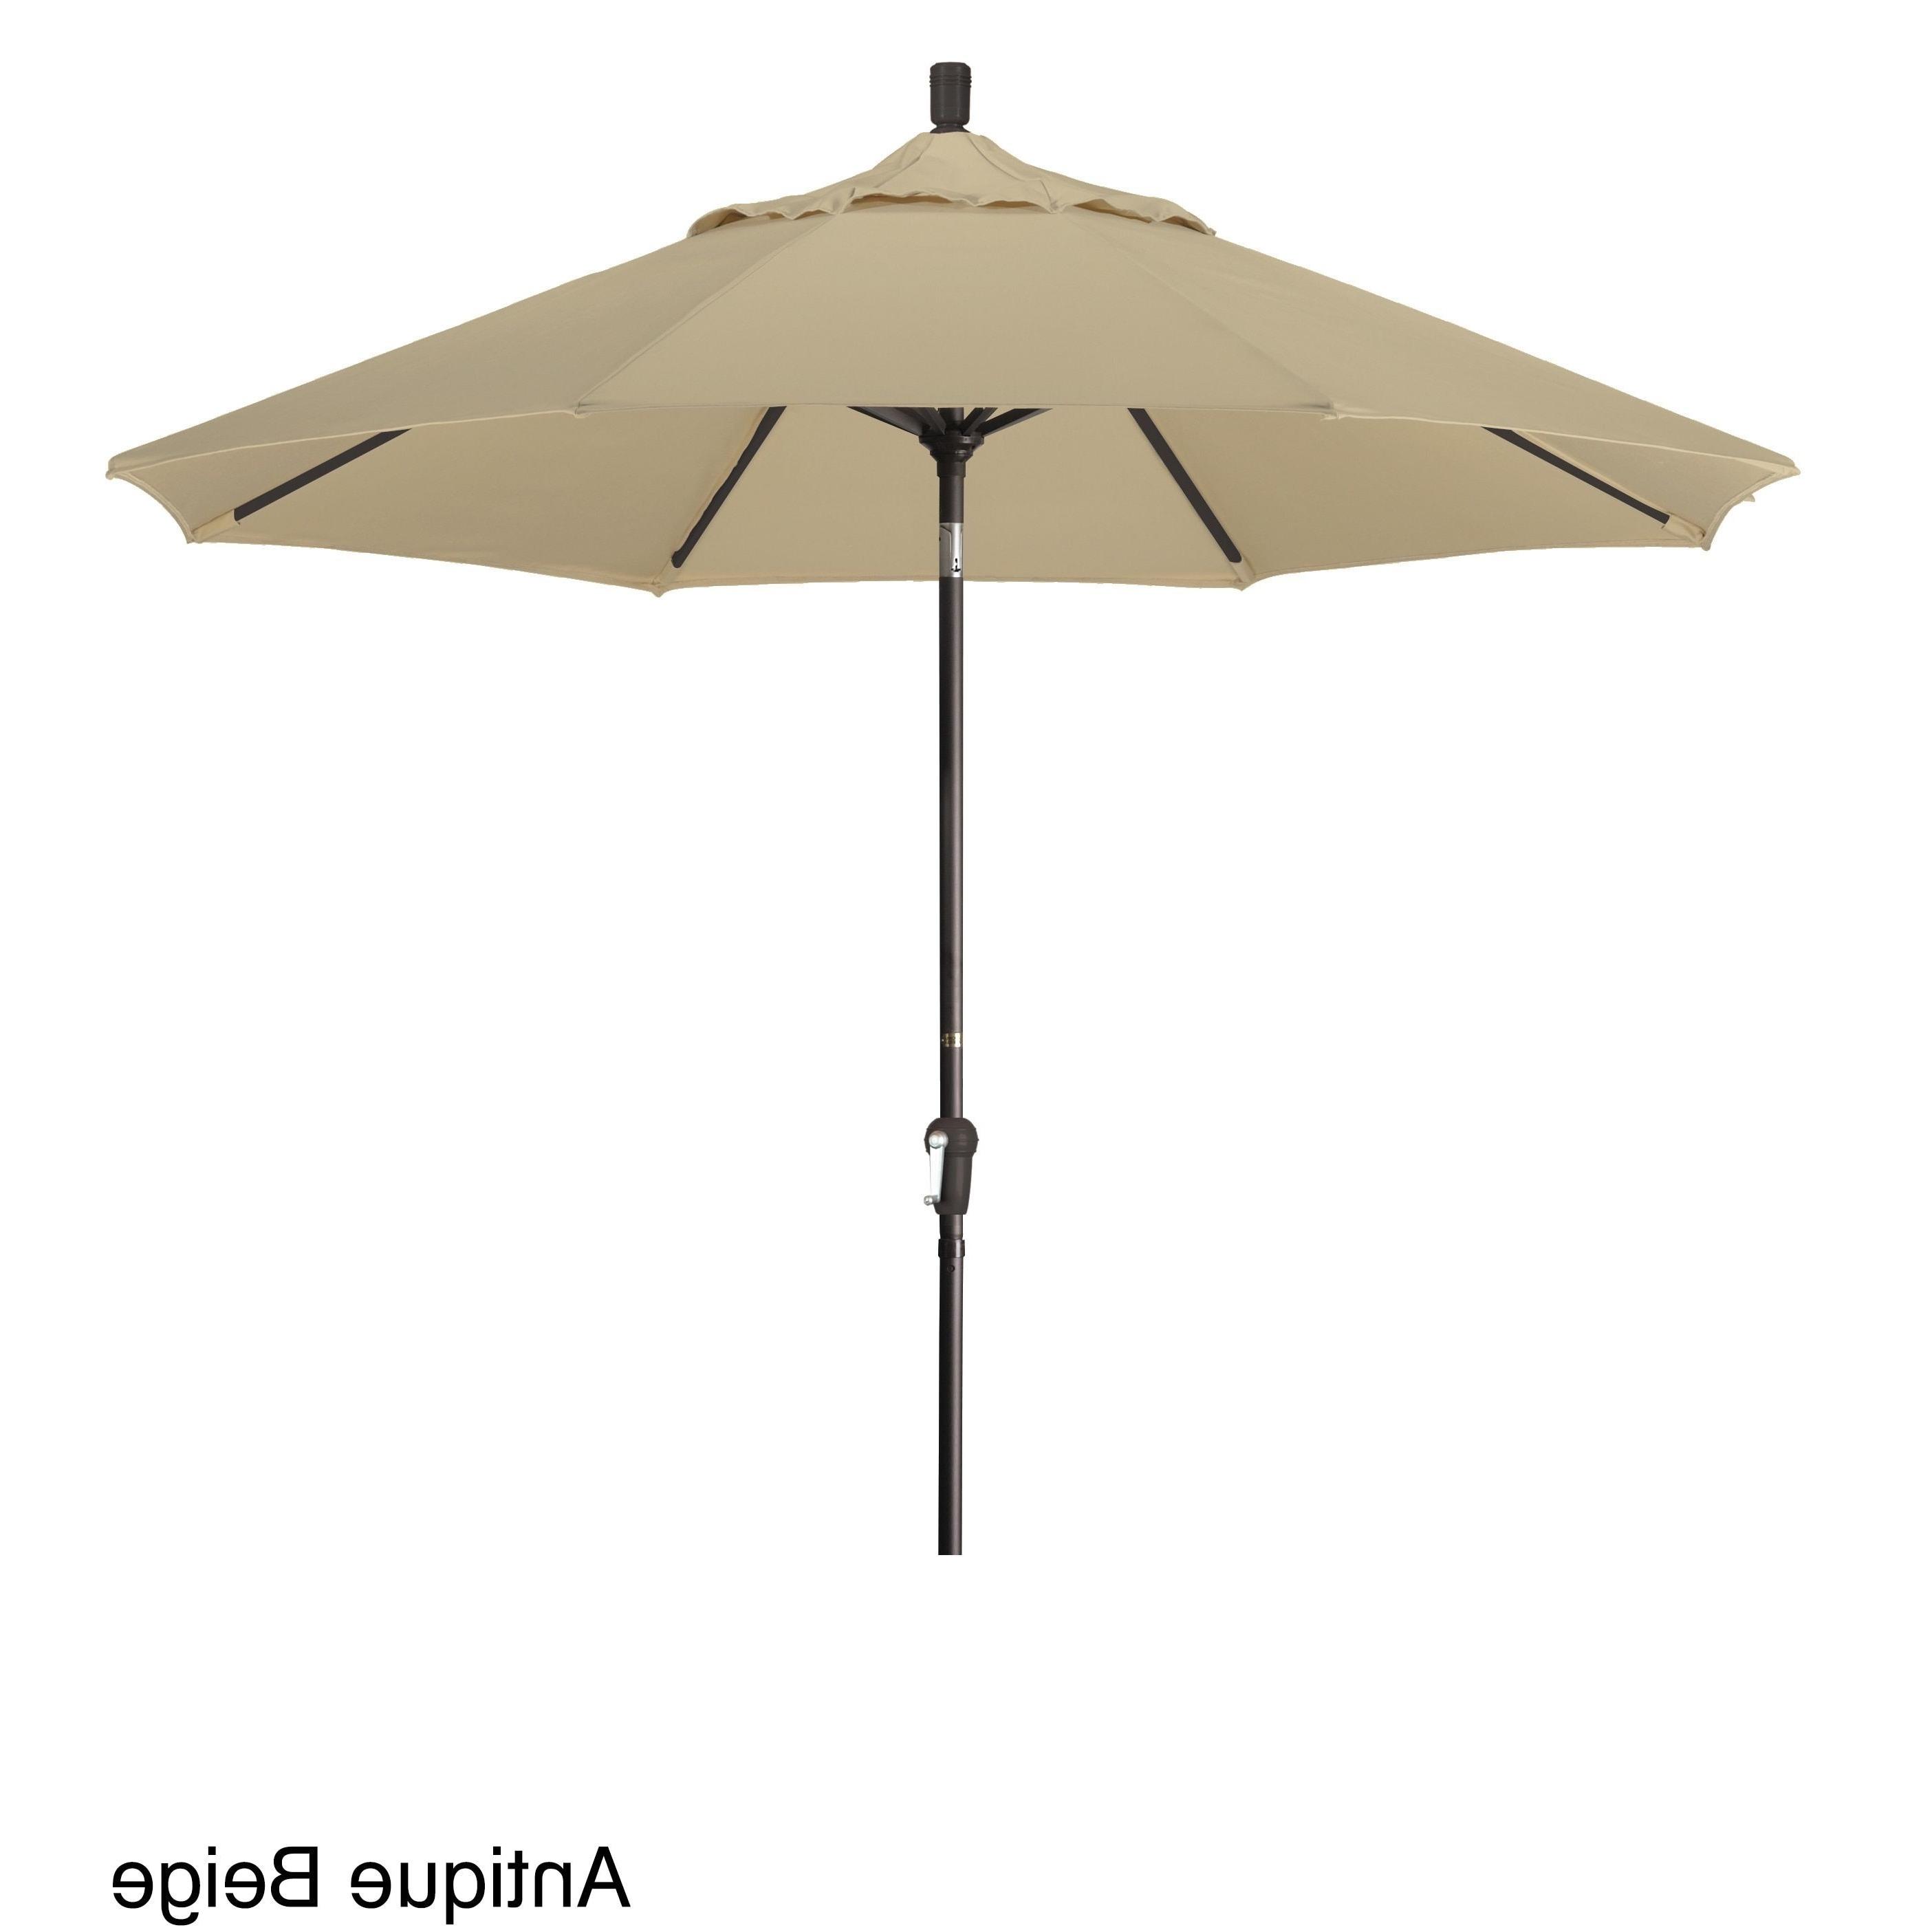 Sunbrella Teak Umbrellas Inside Most Current California Umbrella 9' Round Aluminum Crank Open Auto Tlit Market (View 15 of 20)